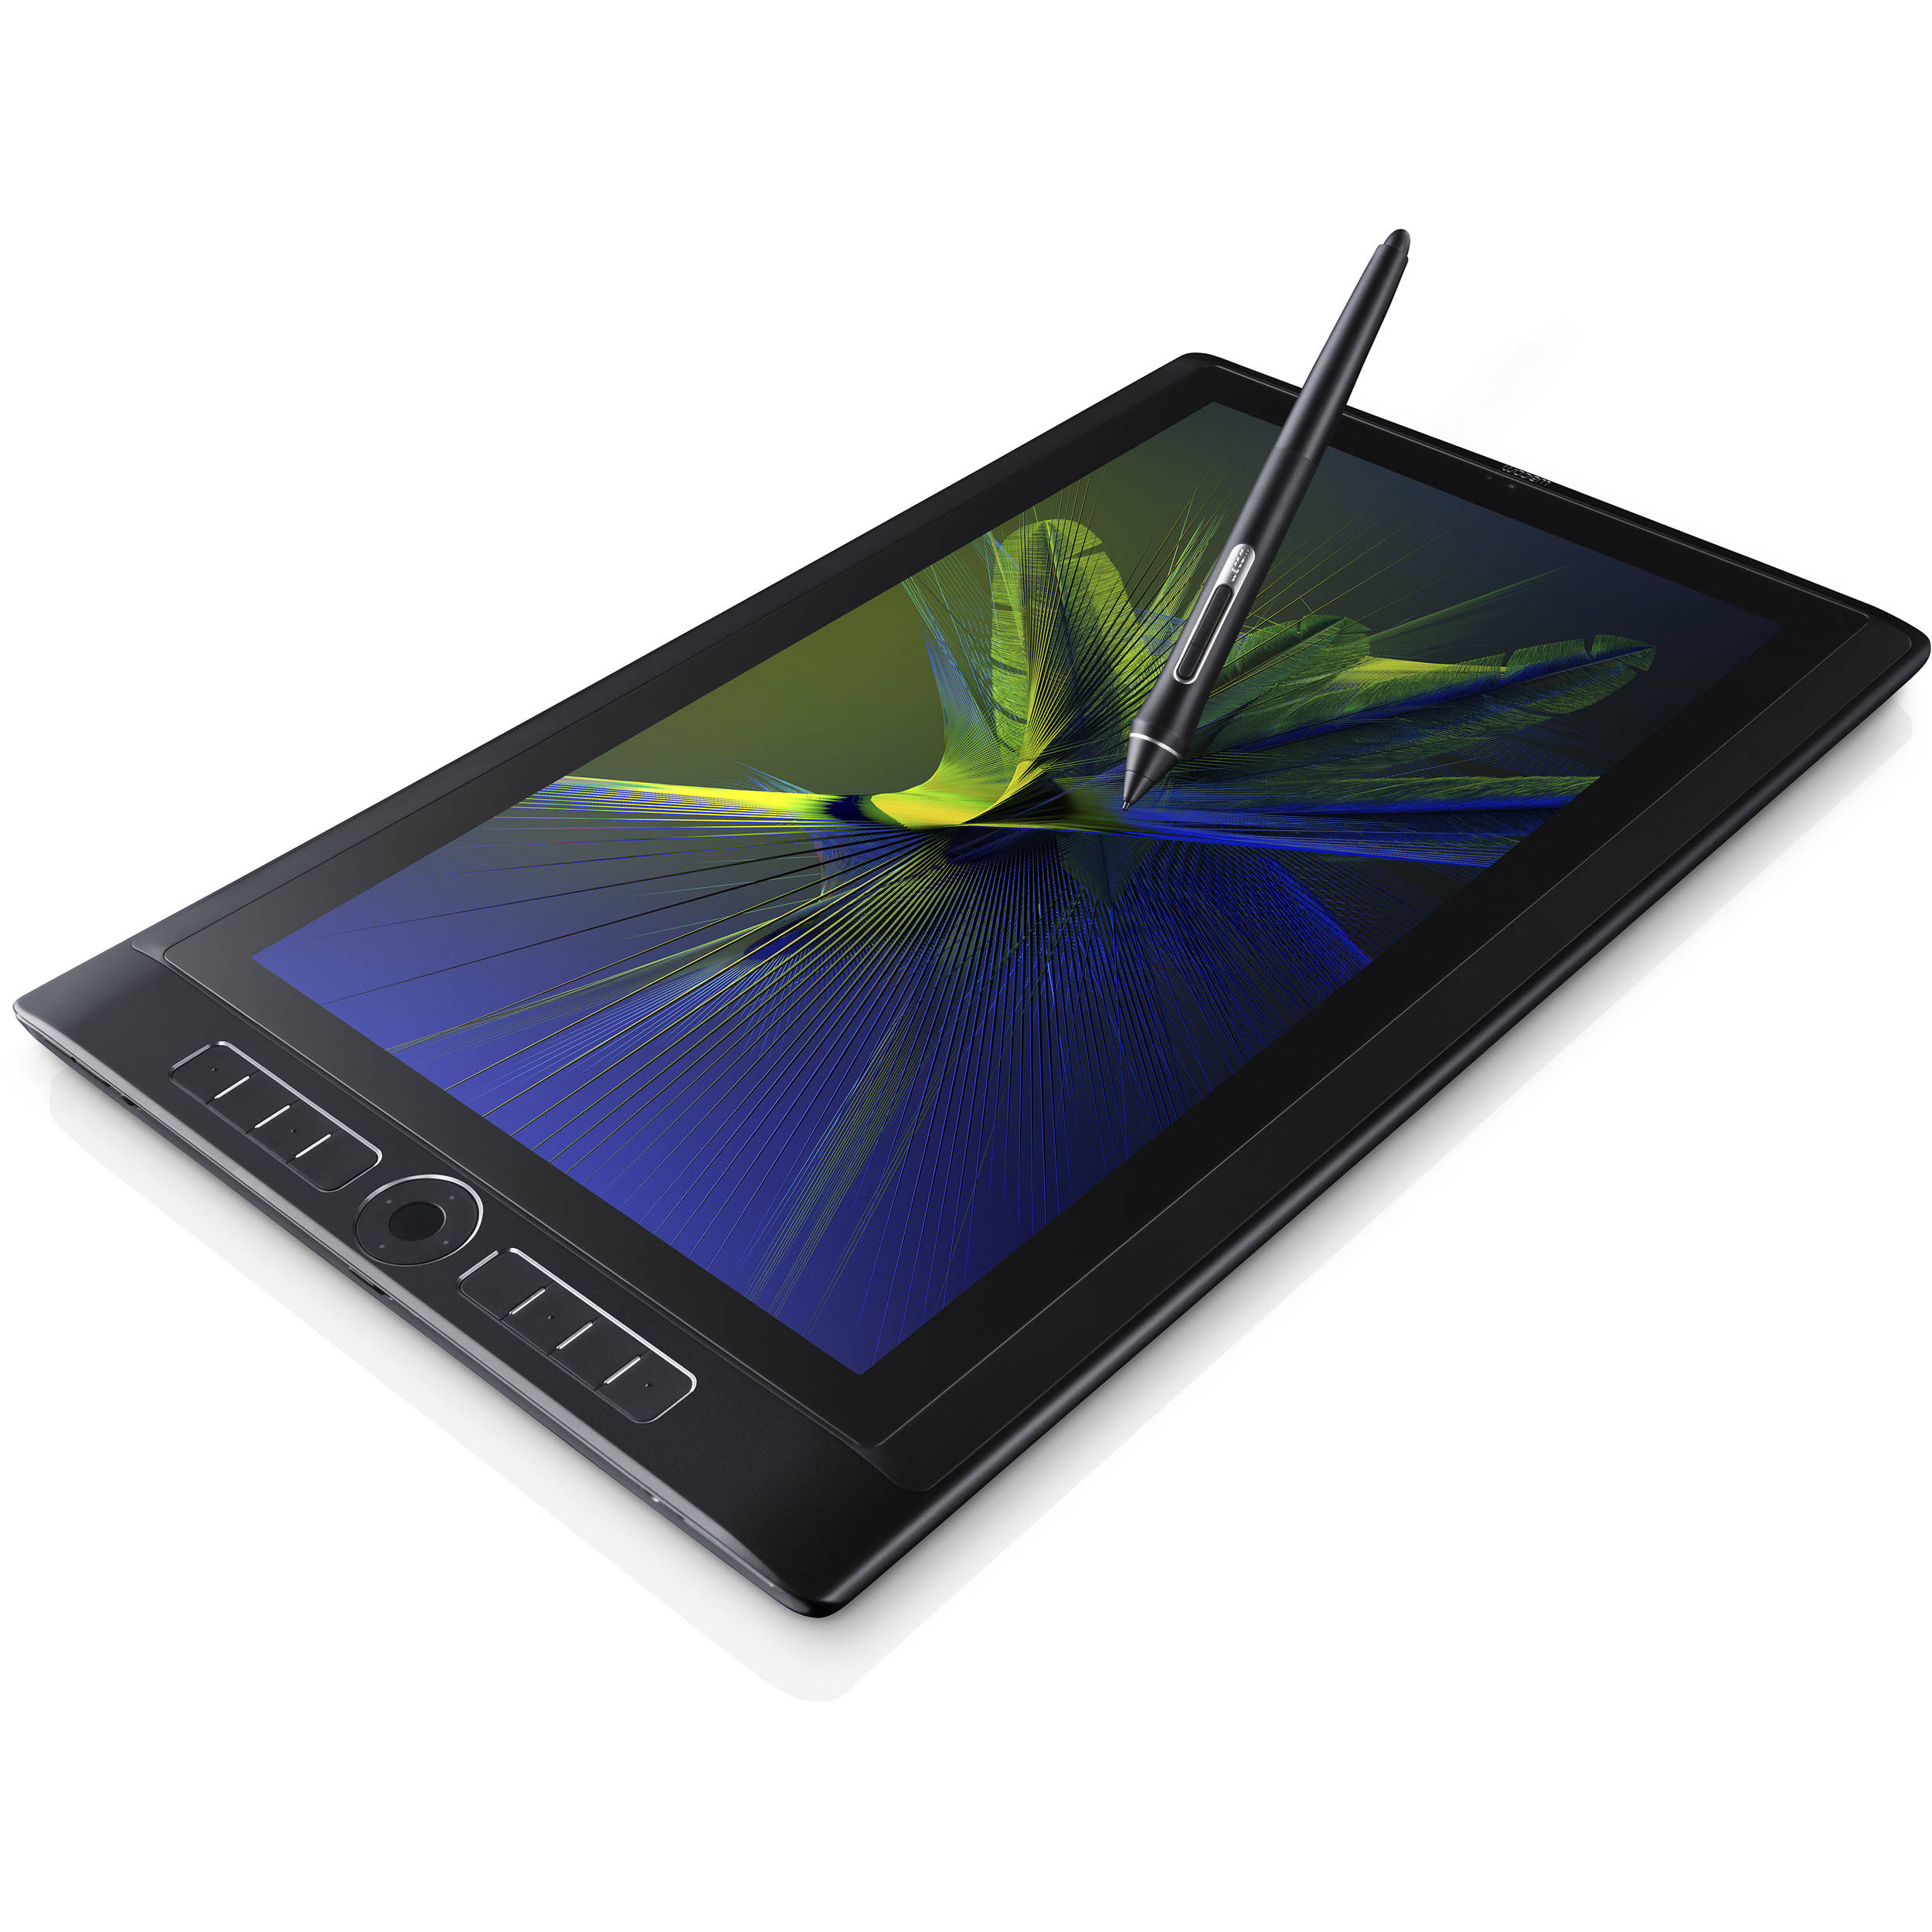 Wacom 156 Mobilestudio Pro 16 Graphics Tablet Dthw1620h Instrument Cluster Circuit Board Is Bad 1000 Bucks Page